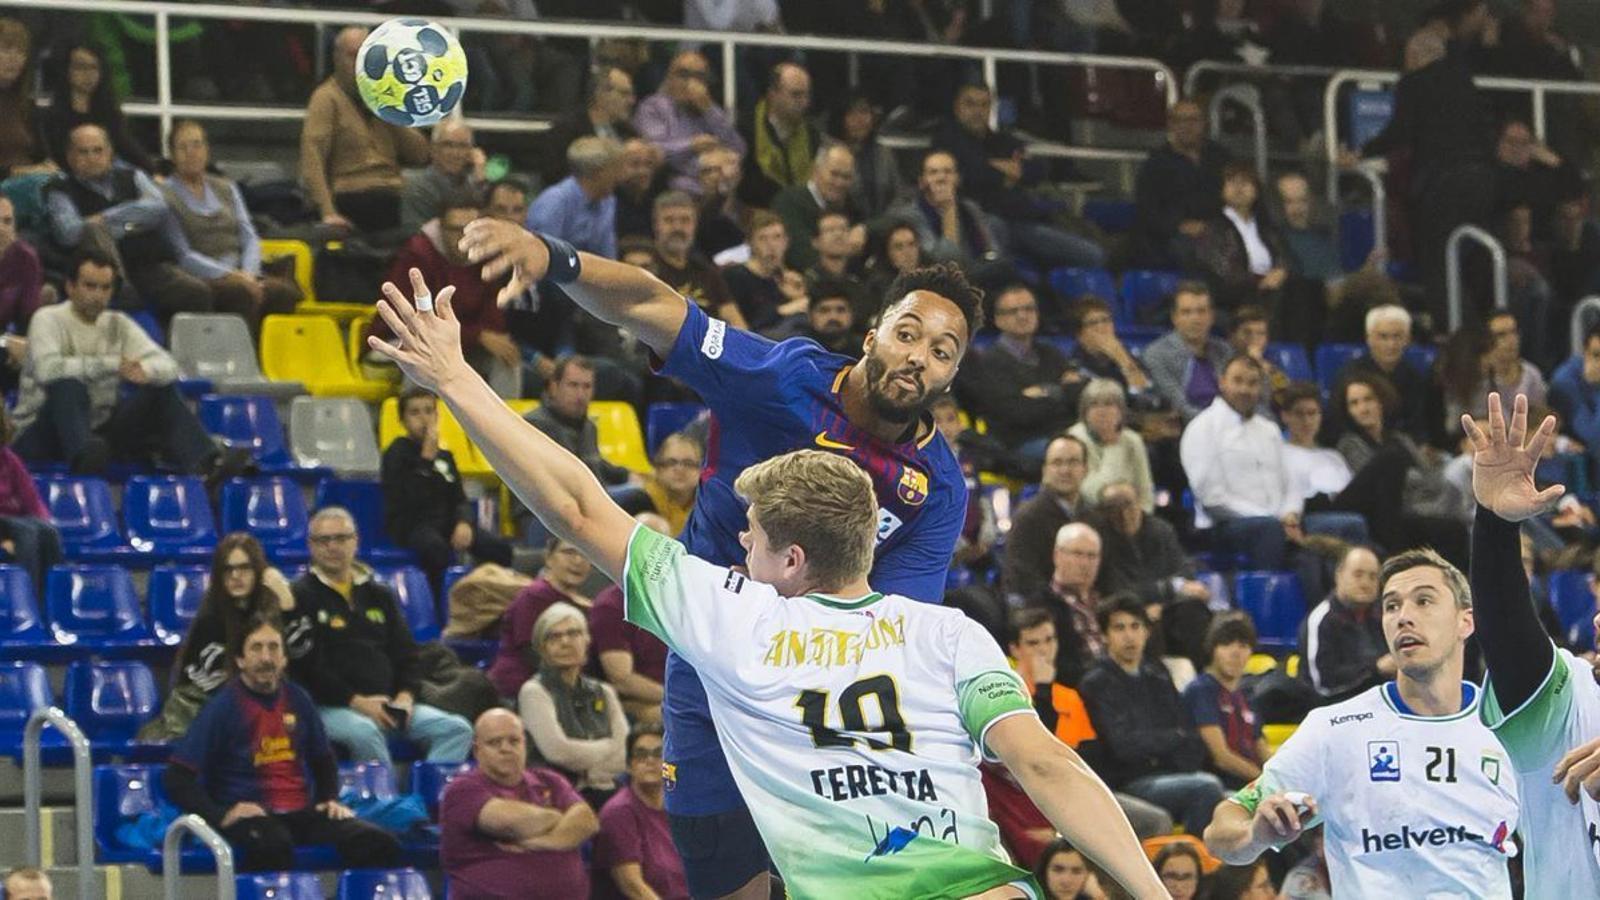 Thimothey N'Guessan intentar fer gol contra l'Anaitasuna